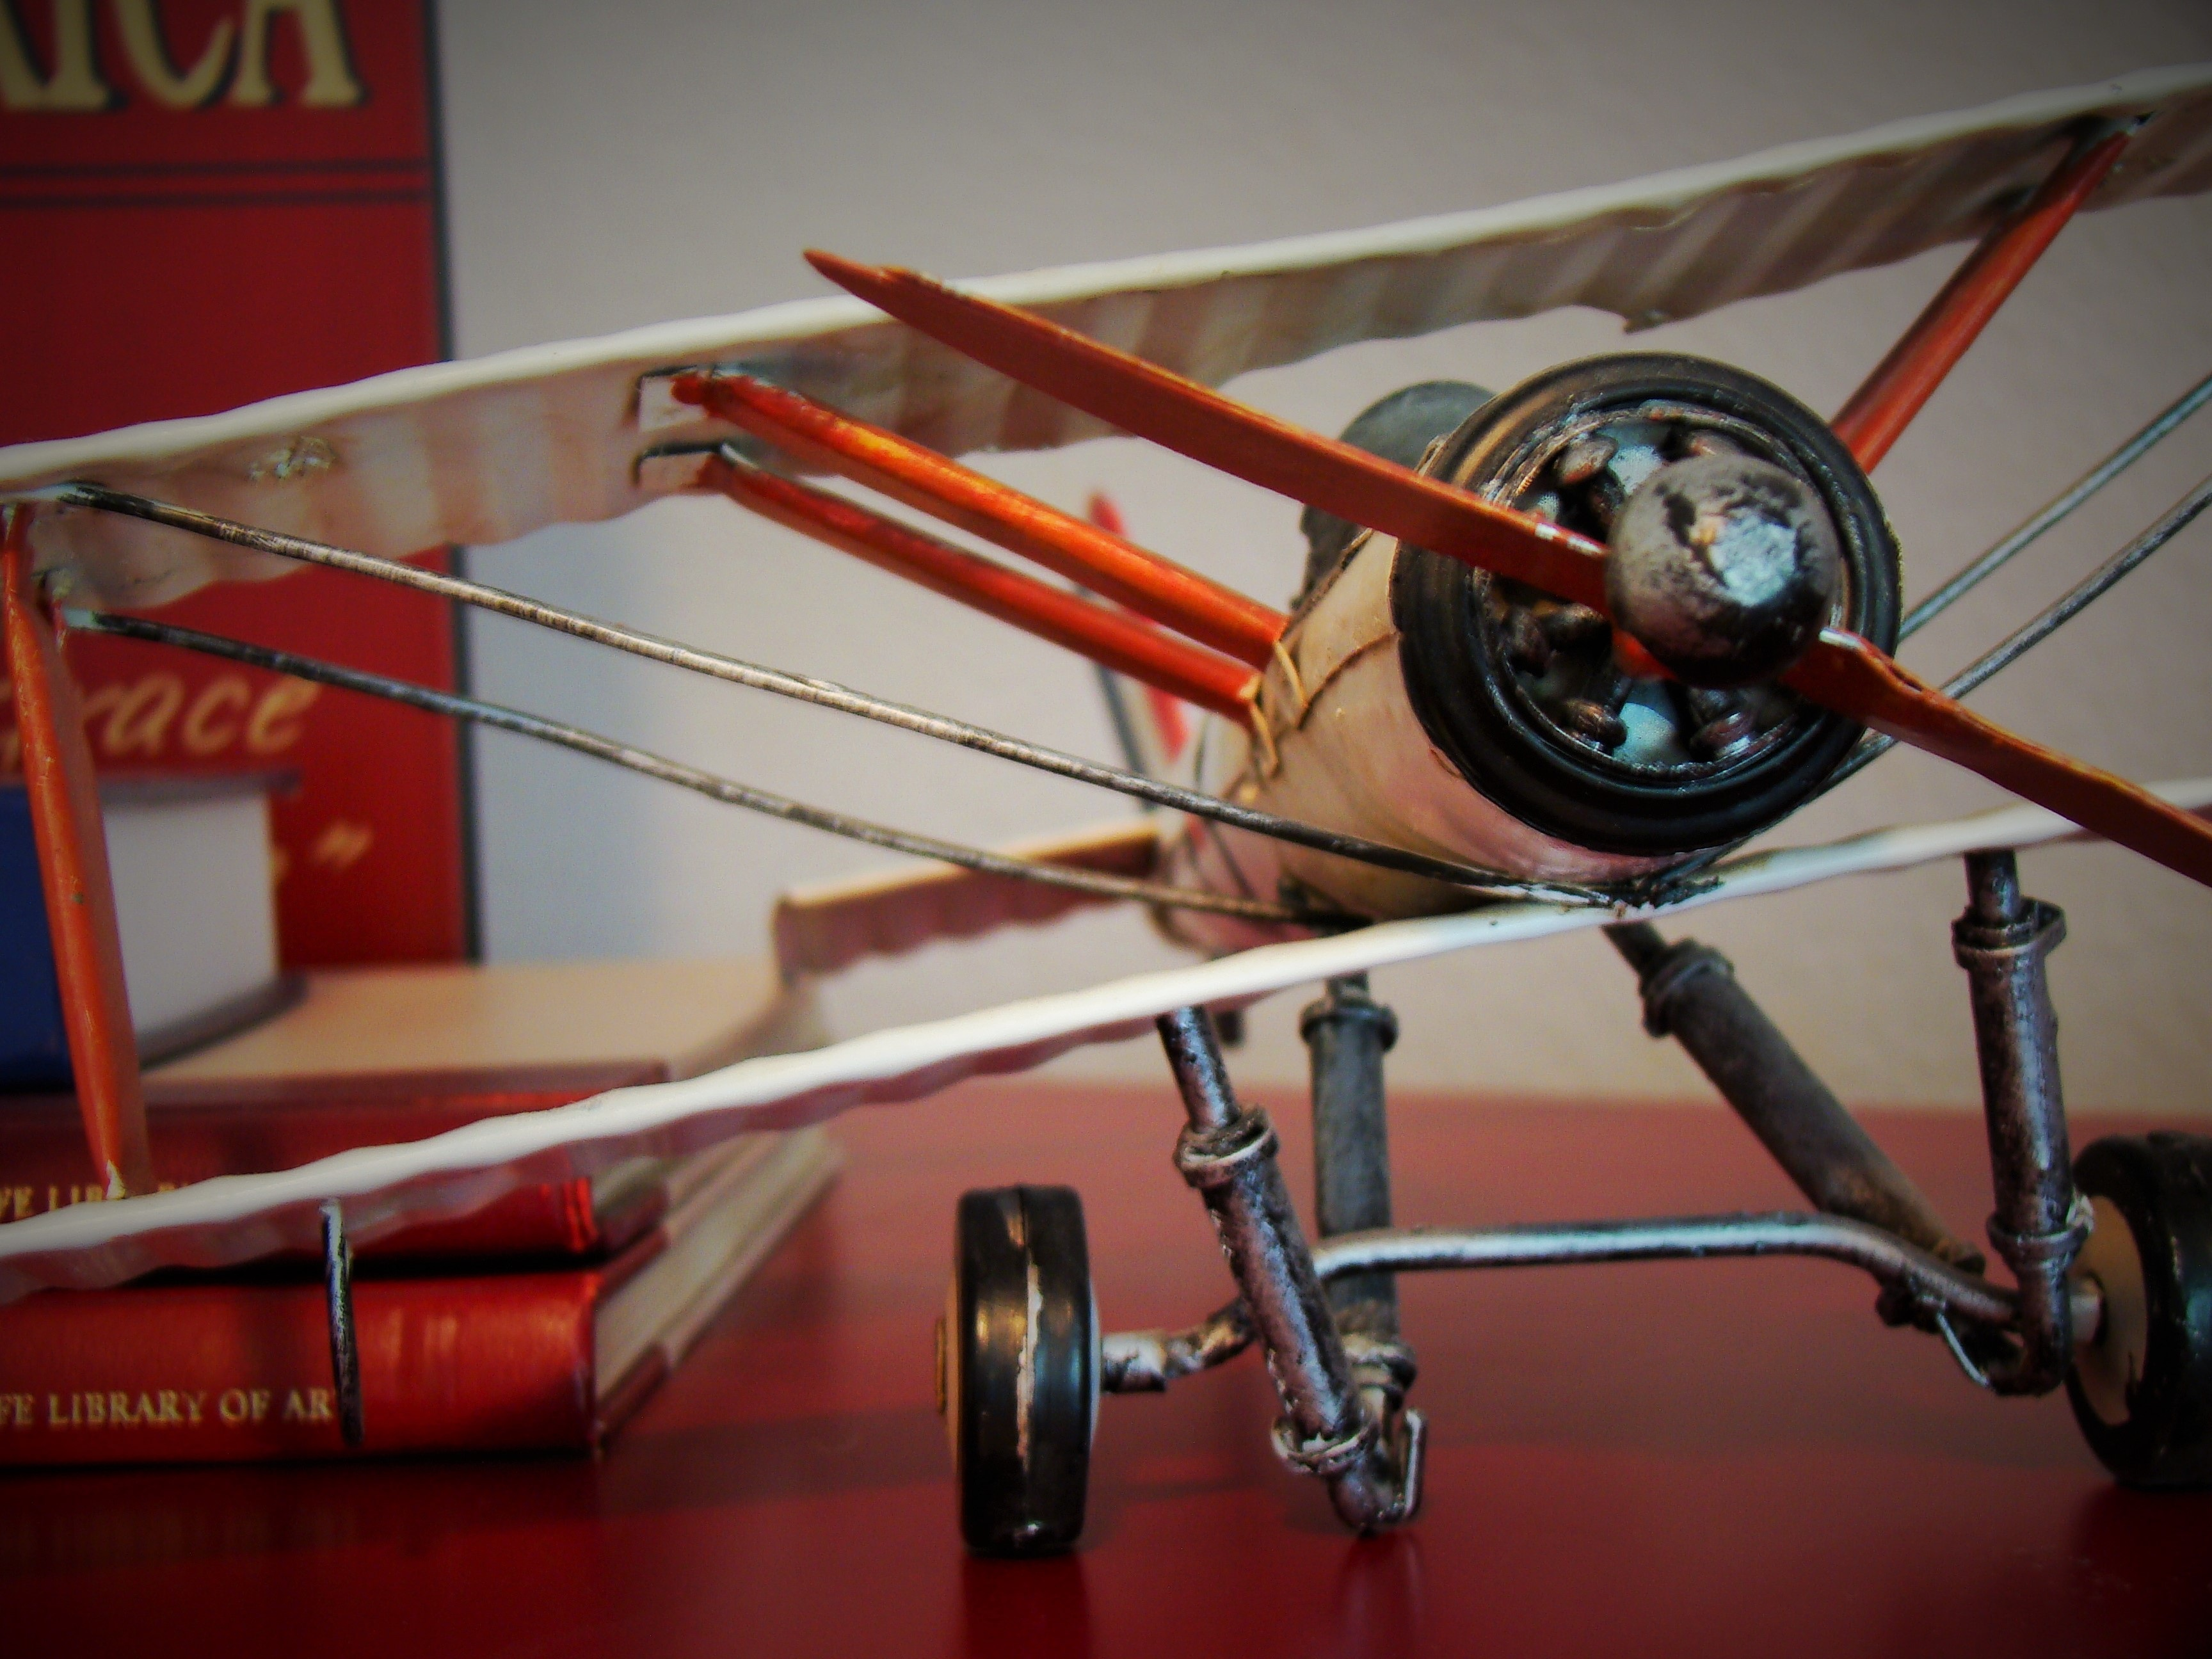 biplane-830972